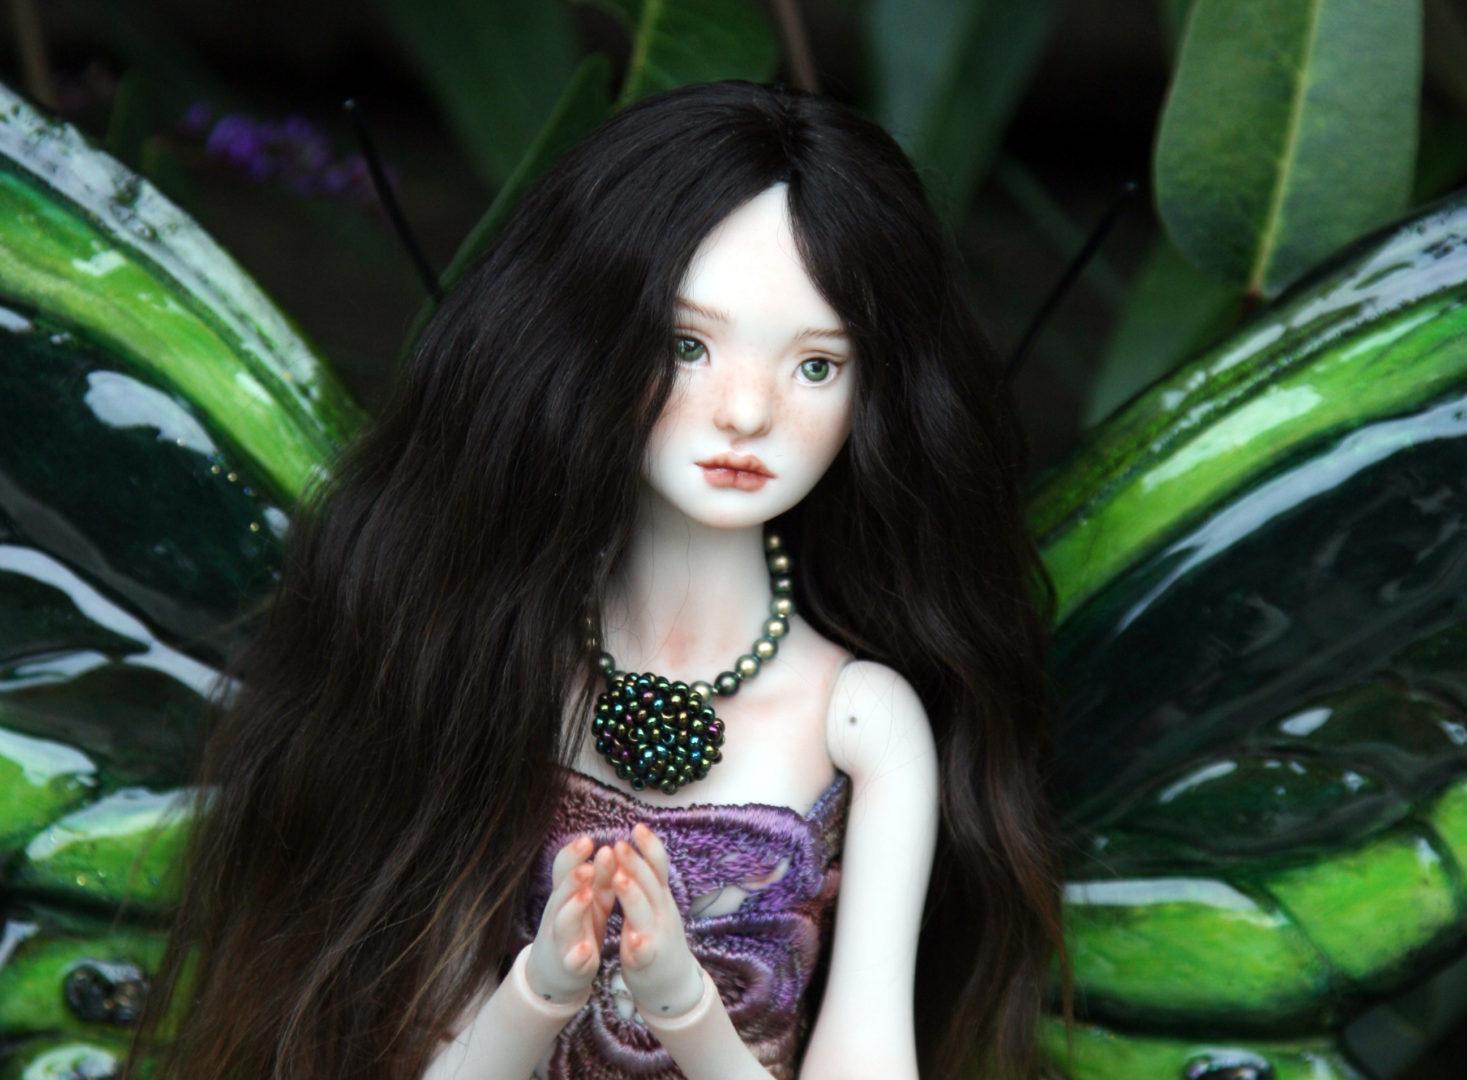 Talarah, my new porcelain ball joint doll